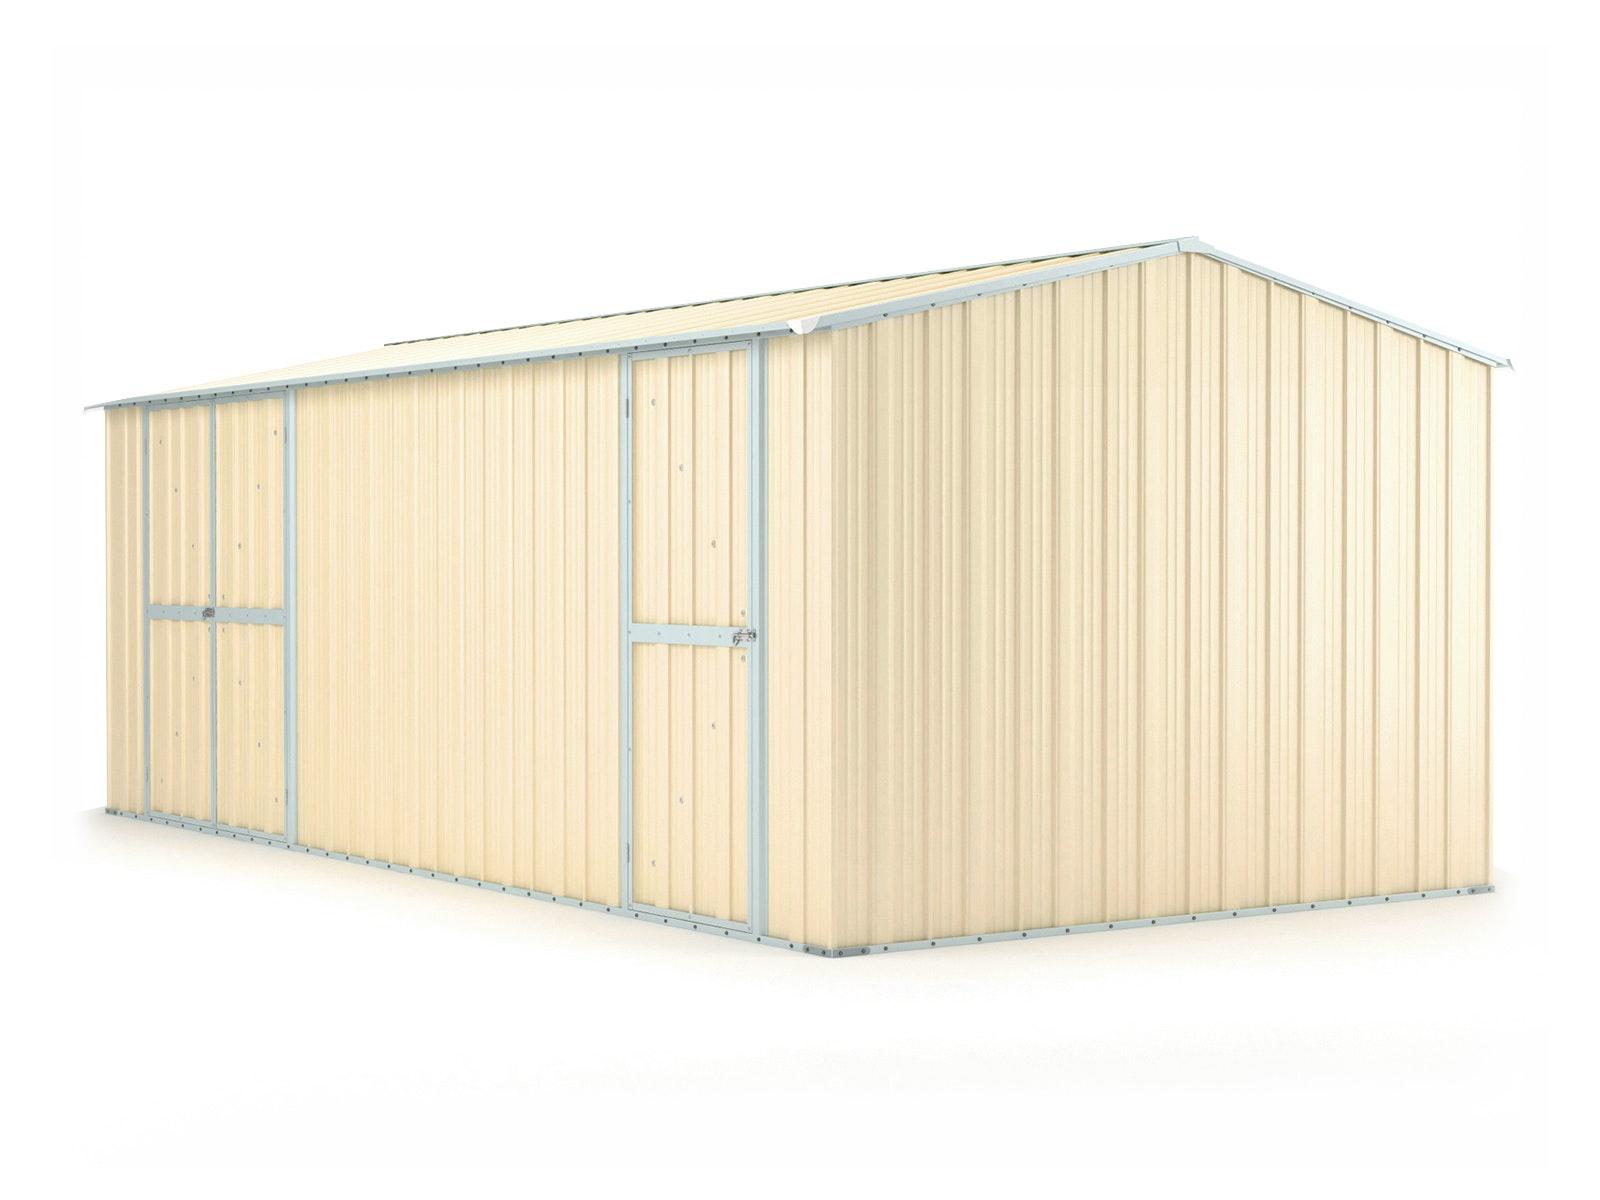 Workshop Shed 6.11m x 3.07m x 2.27m Cream